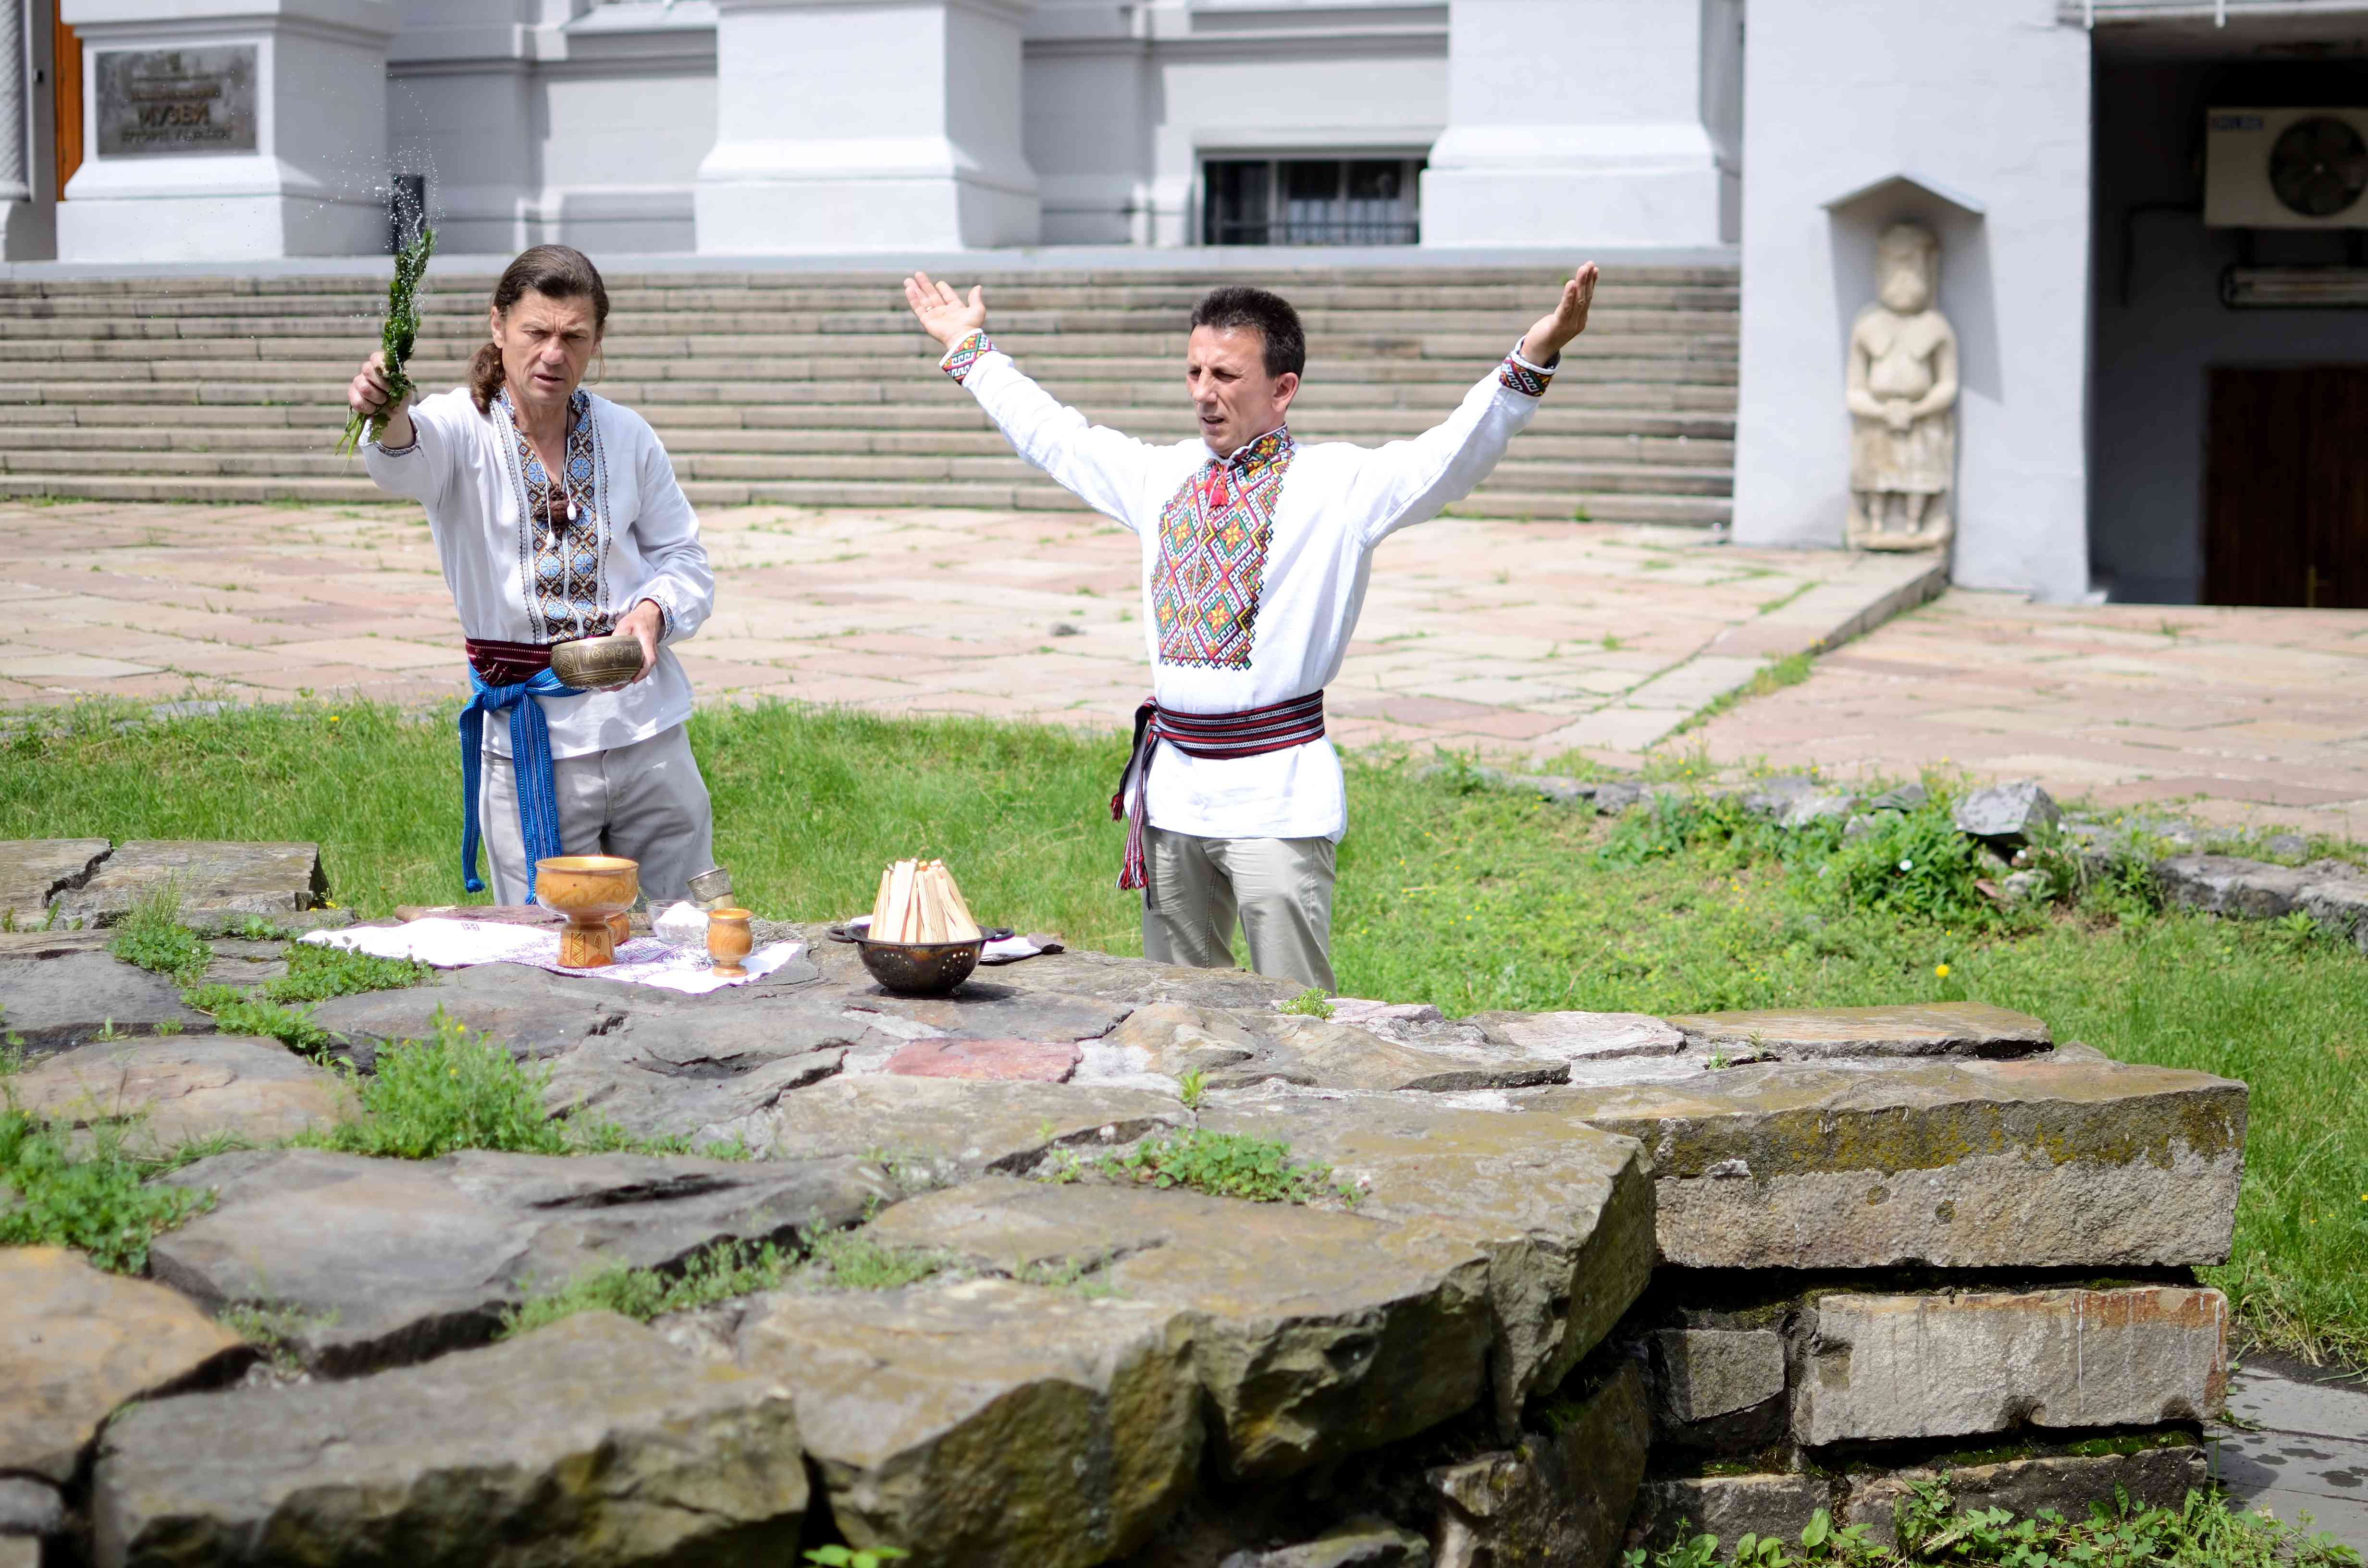 ukrainian pagan community making ritual ceremony dedicated to Perun,Ukraine